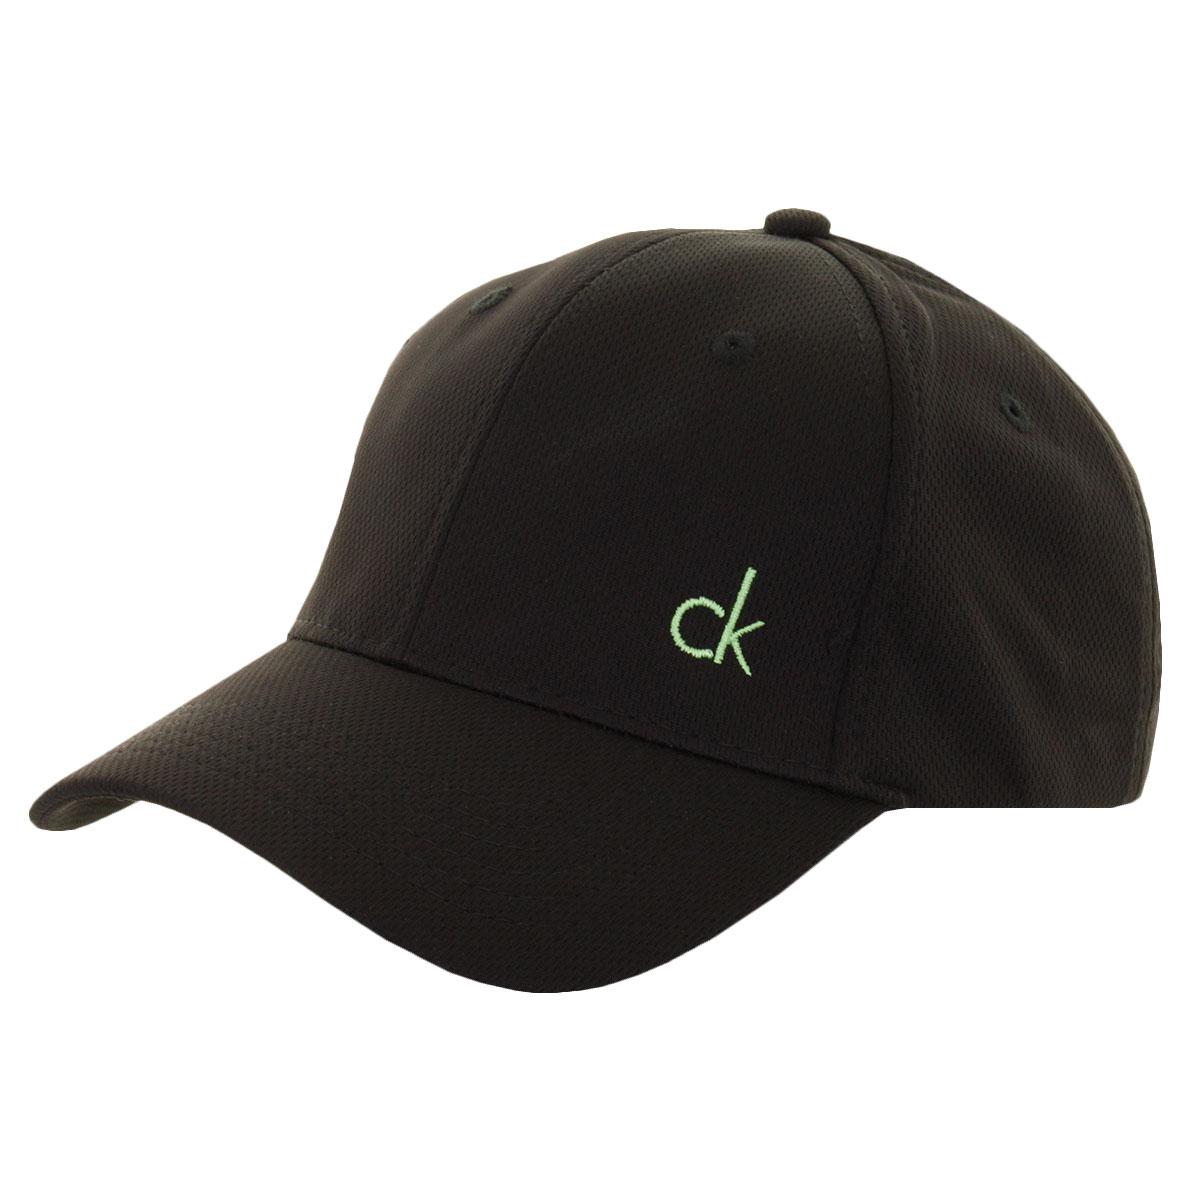 calvin klein golf 2017 mens ck airtex adjustable mesh cap baseball hat ebay. Black Bedroom Furniture Sets. Home Design Ideas